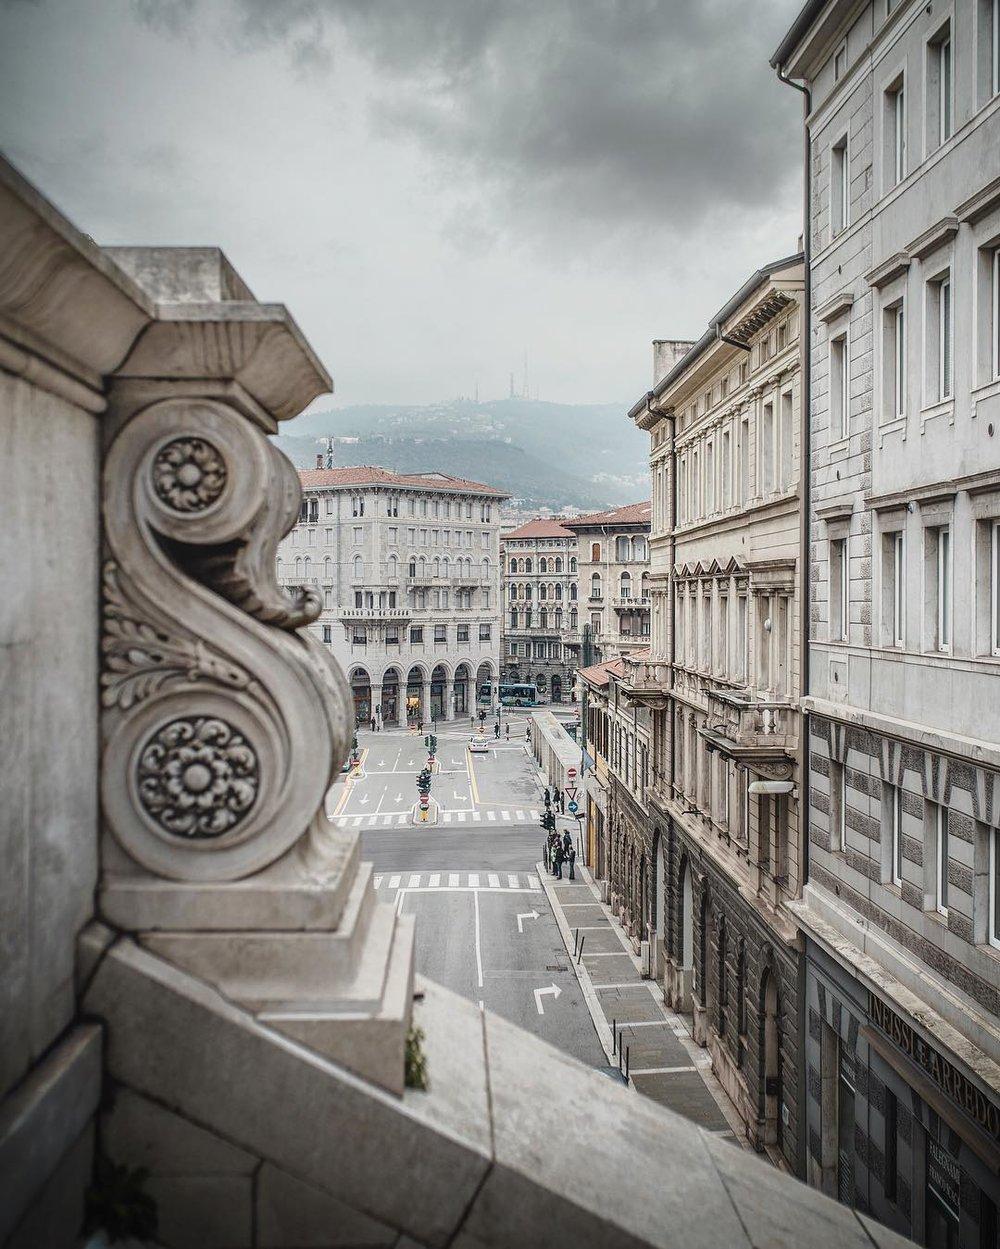 Trieste - Piazza Goldoni